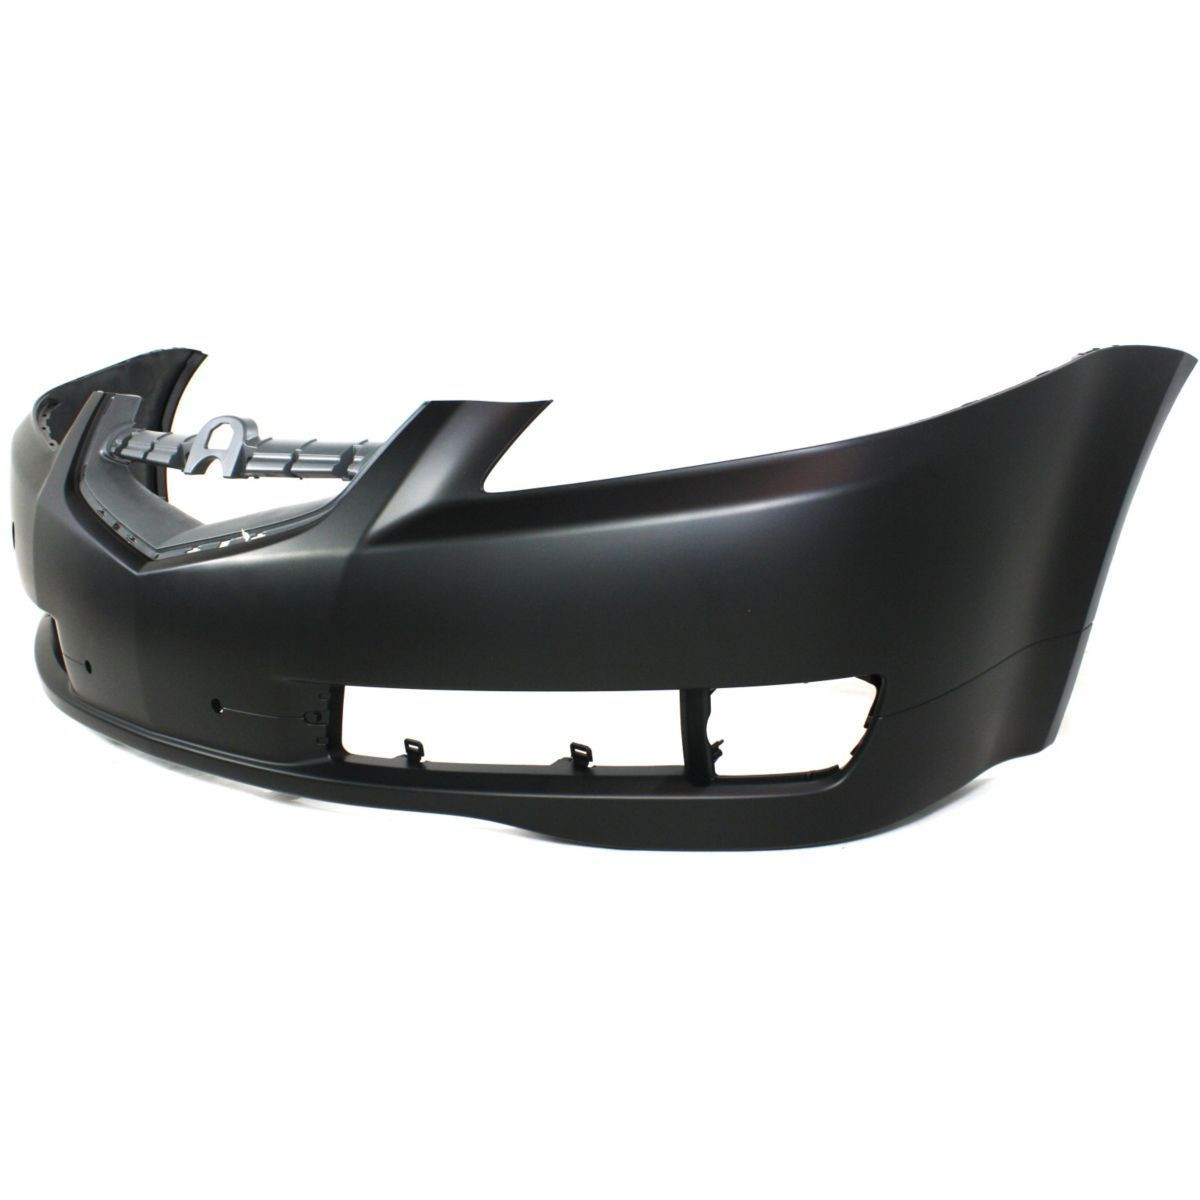 Genuine OEM Acura TL Base Front Bumper - 2007 acura tl front bumper